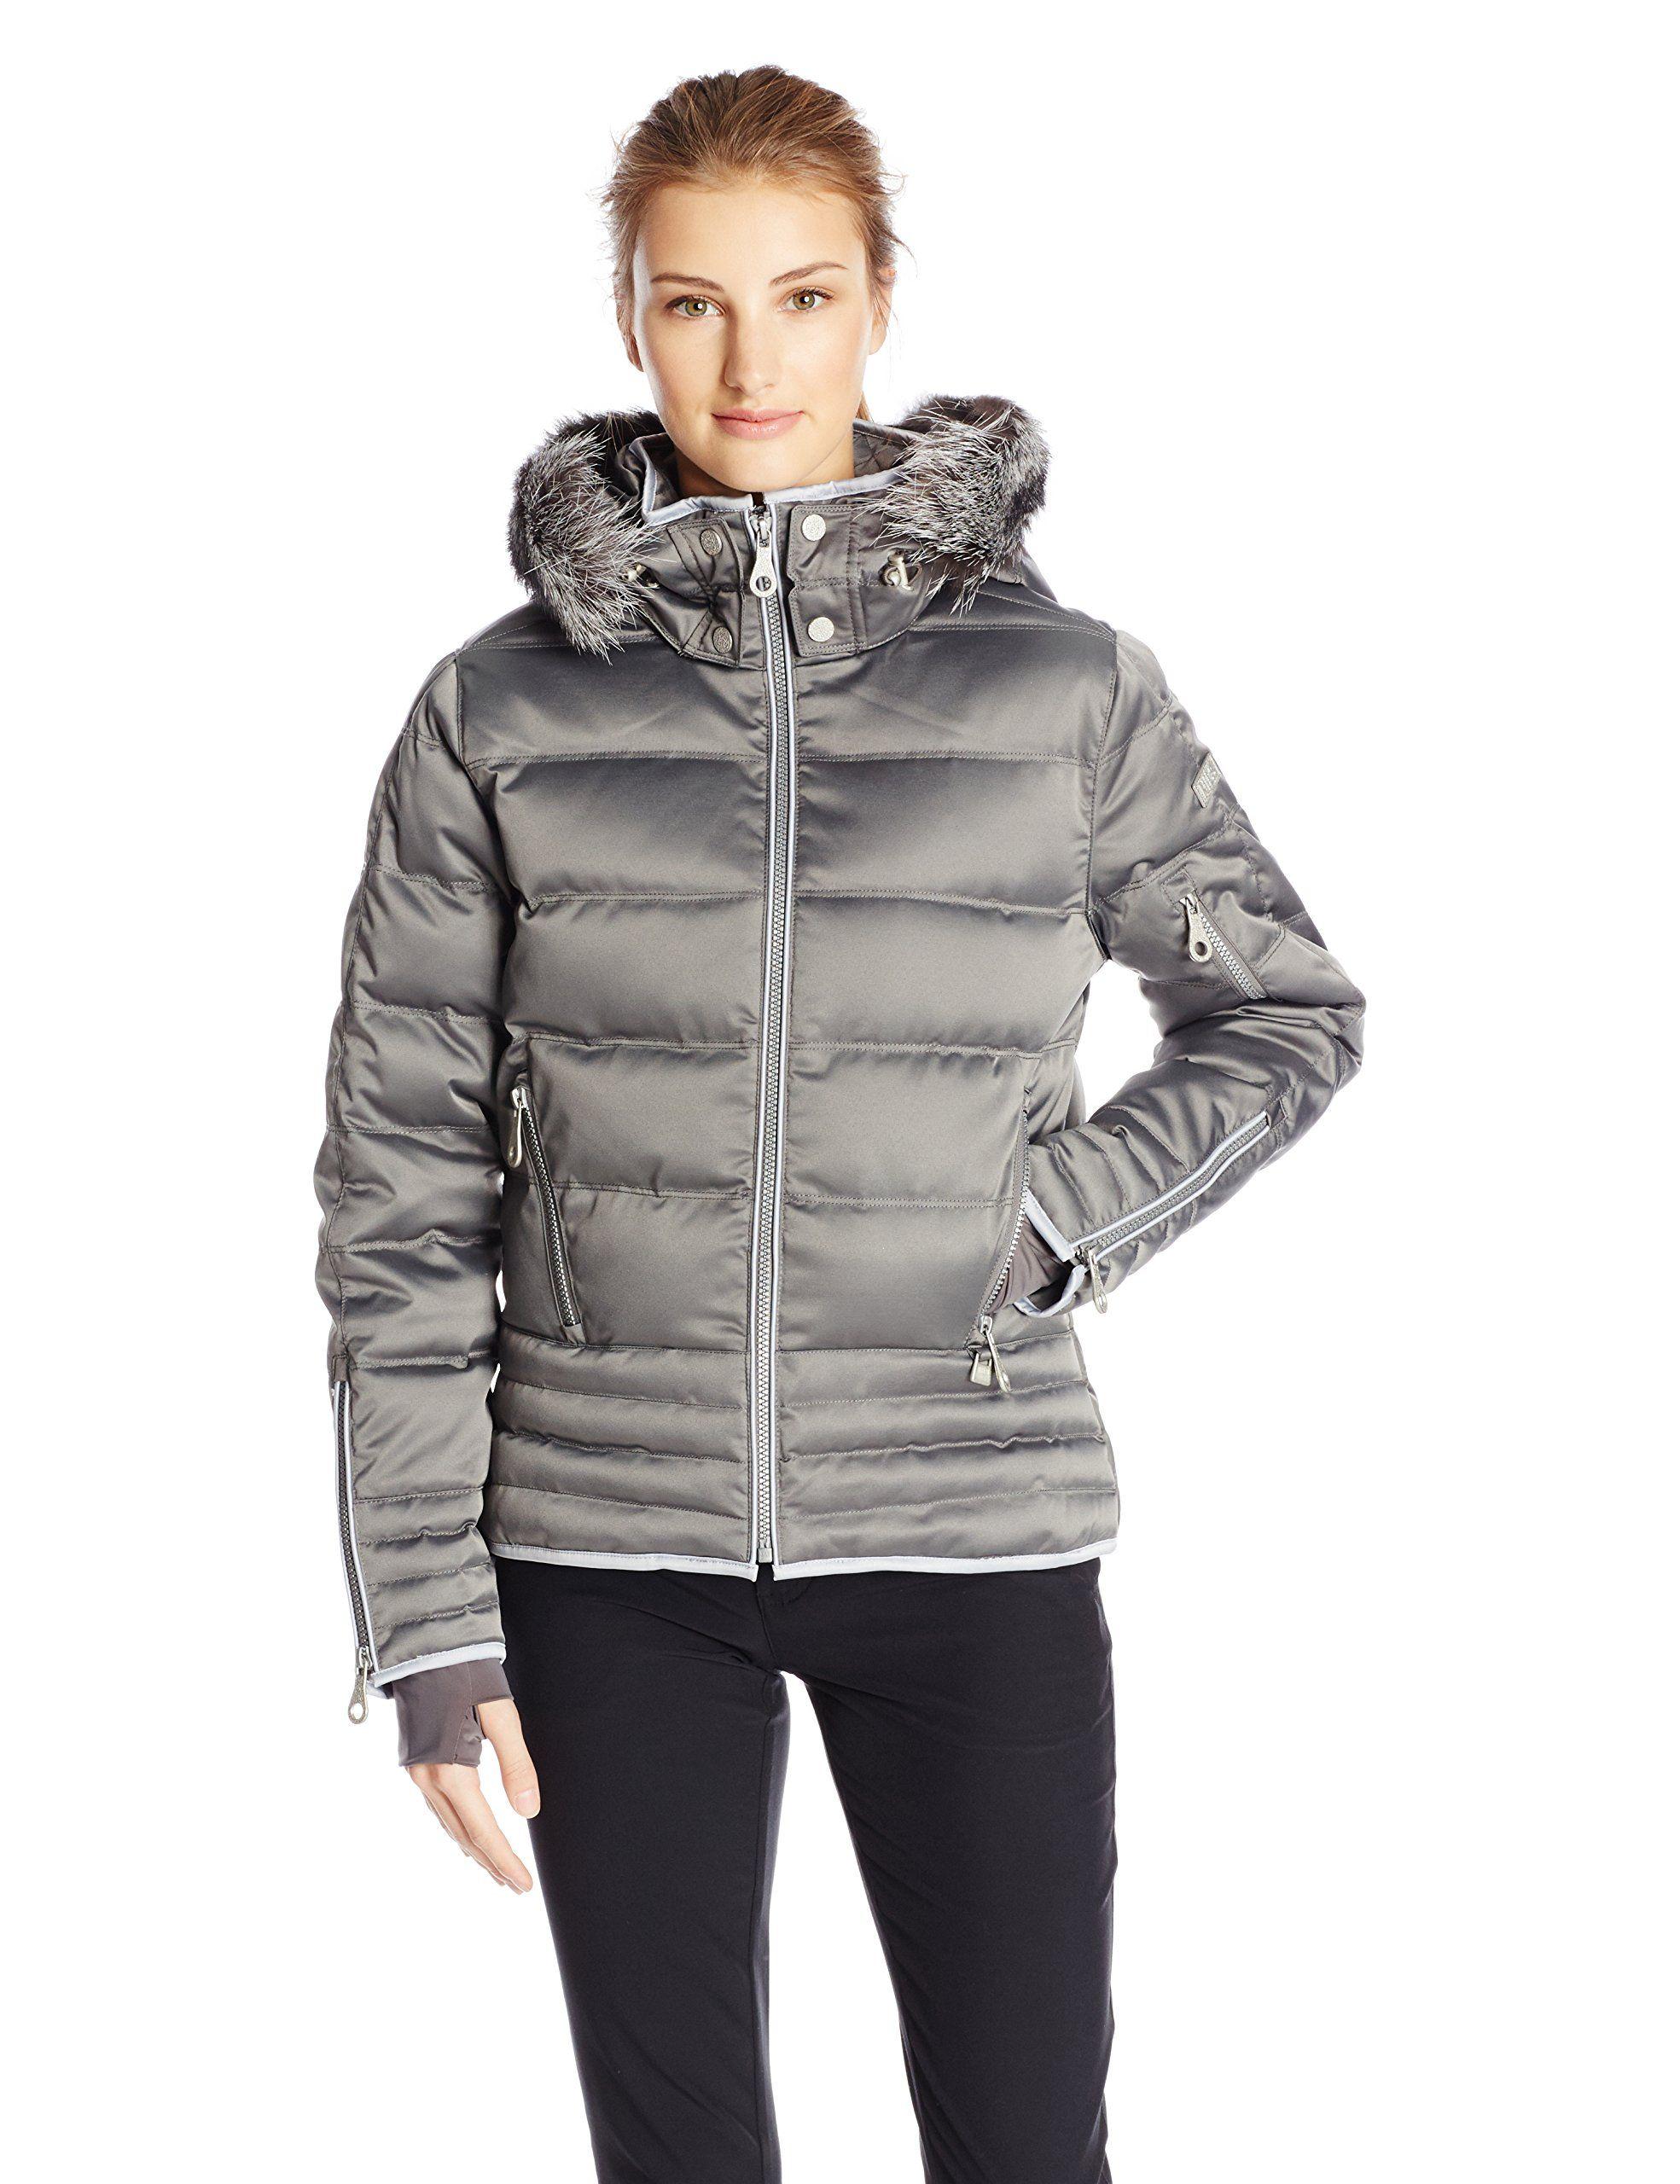 ea3c149a93f Nils Women's Larisa Real Fur Jacket, Pewter, 4. Fleece Lined Chin Guard.